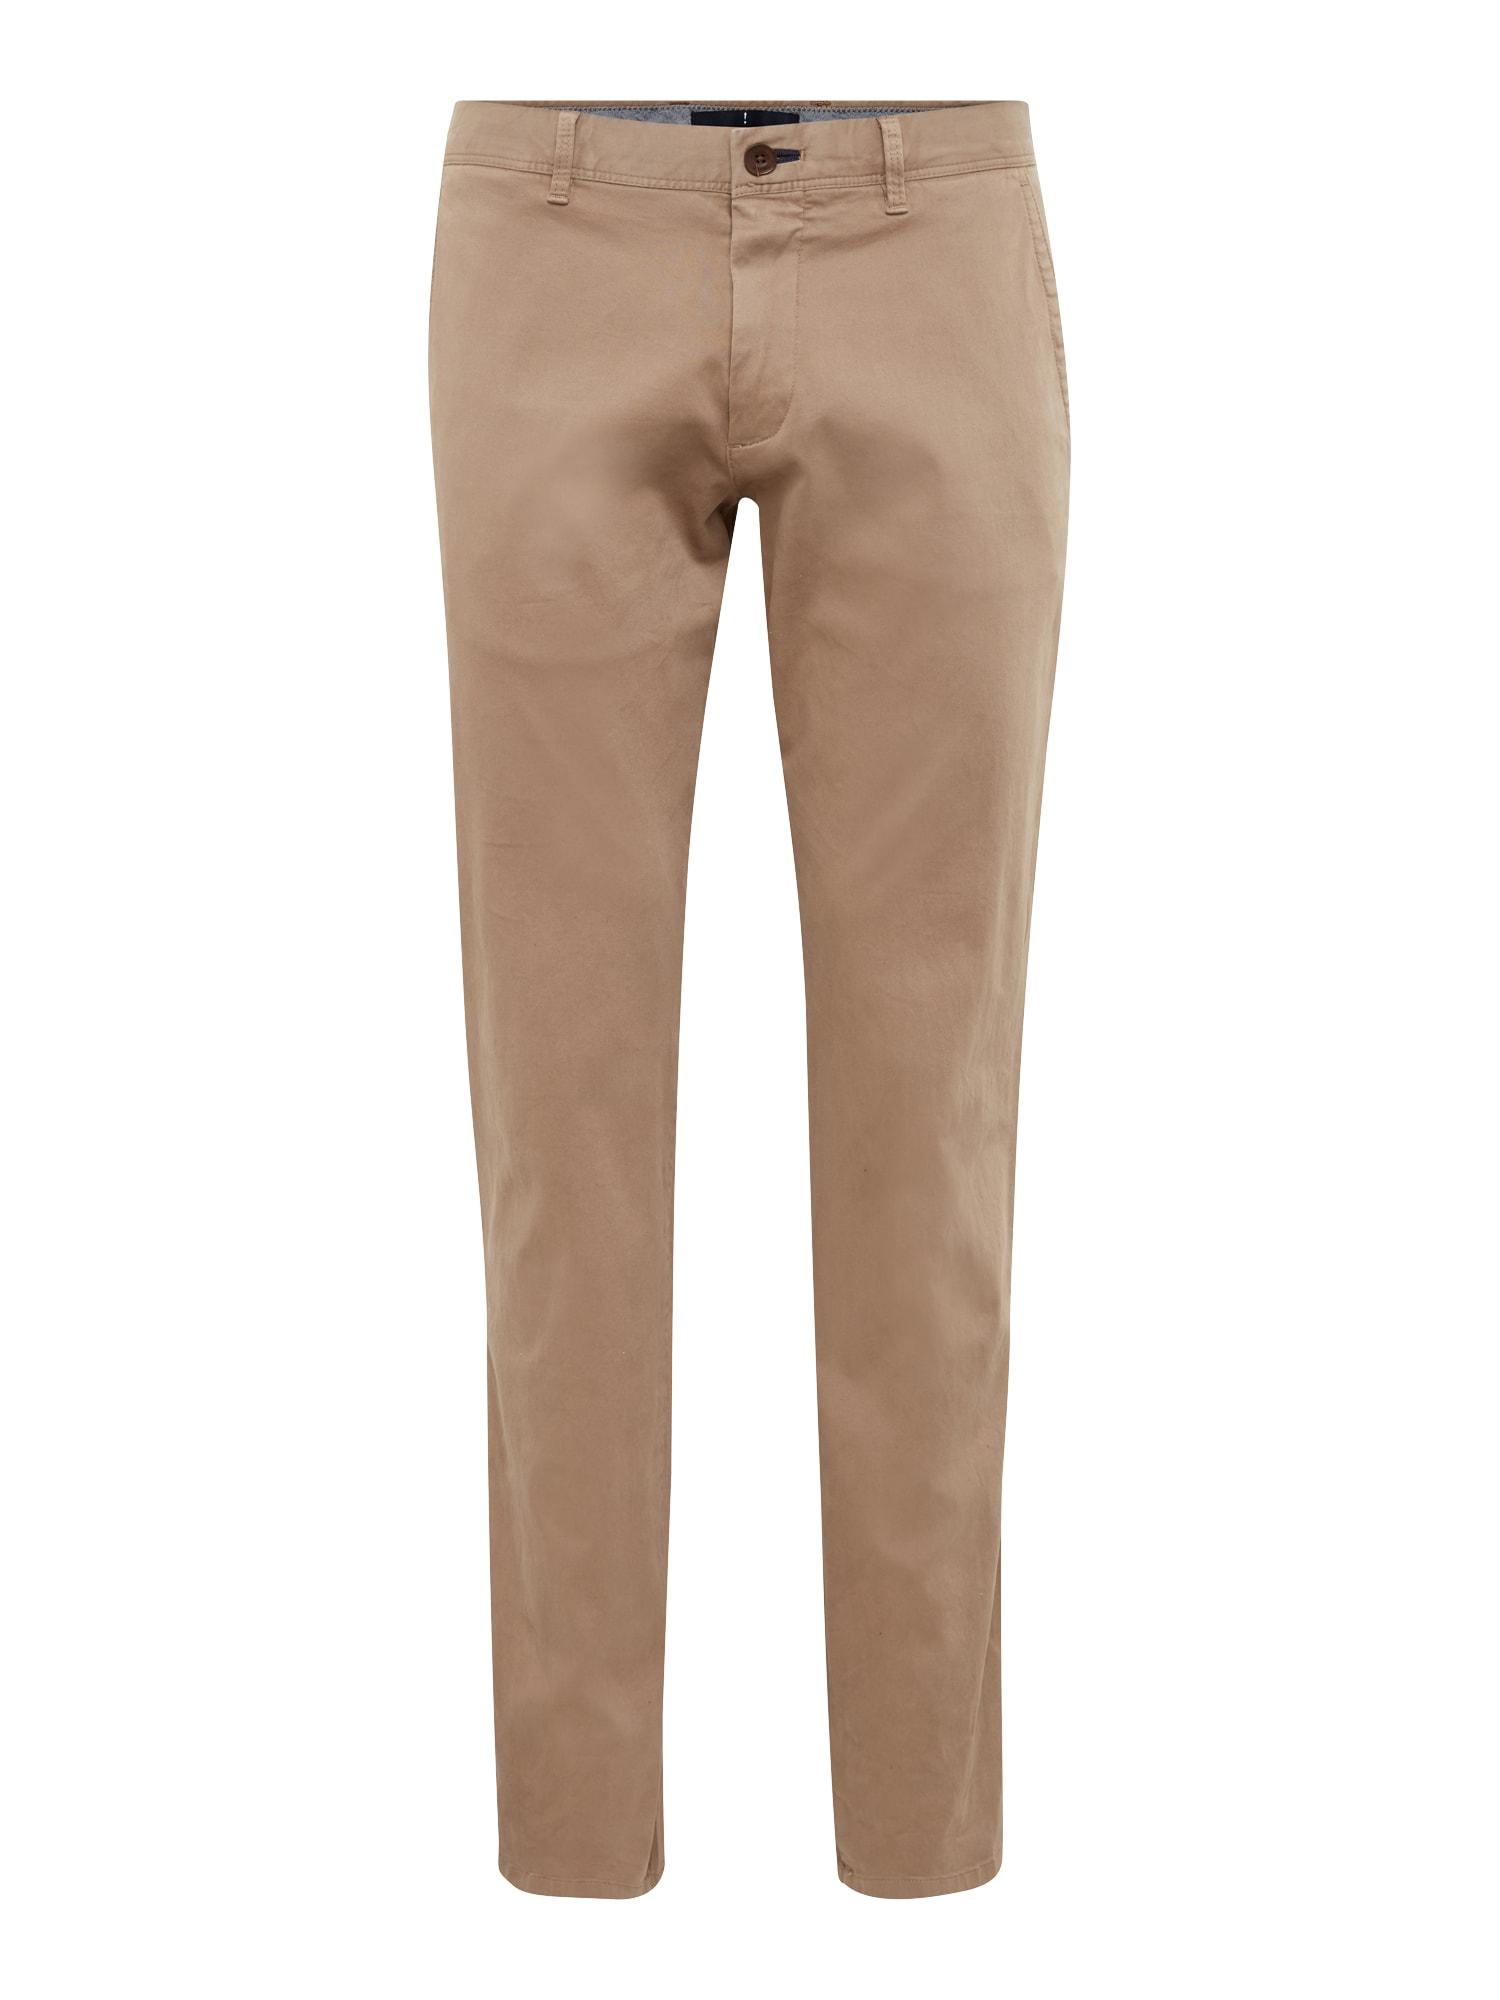 Chino kalhoty 15 JJF-20Matthew-D 10000625 velbloudí JOOP!